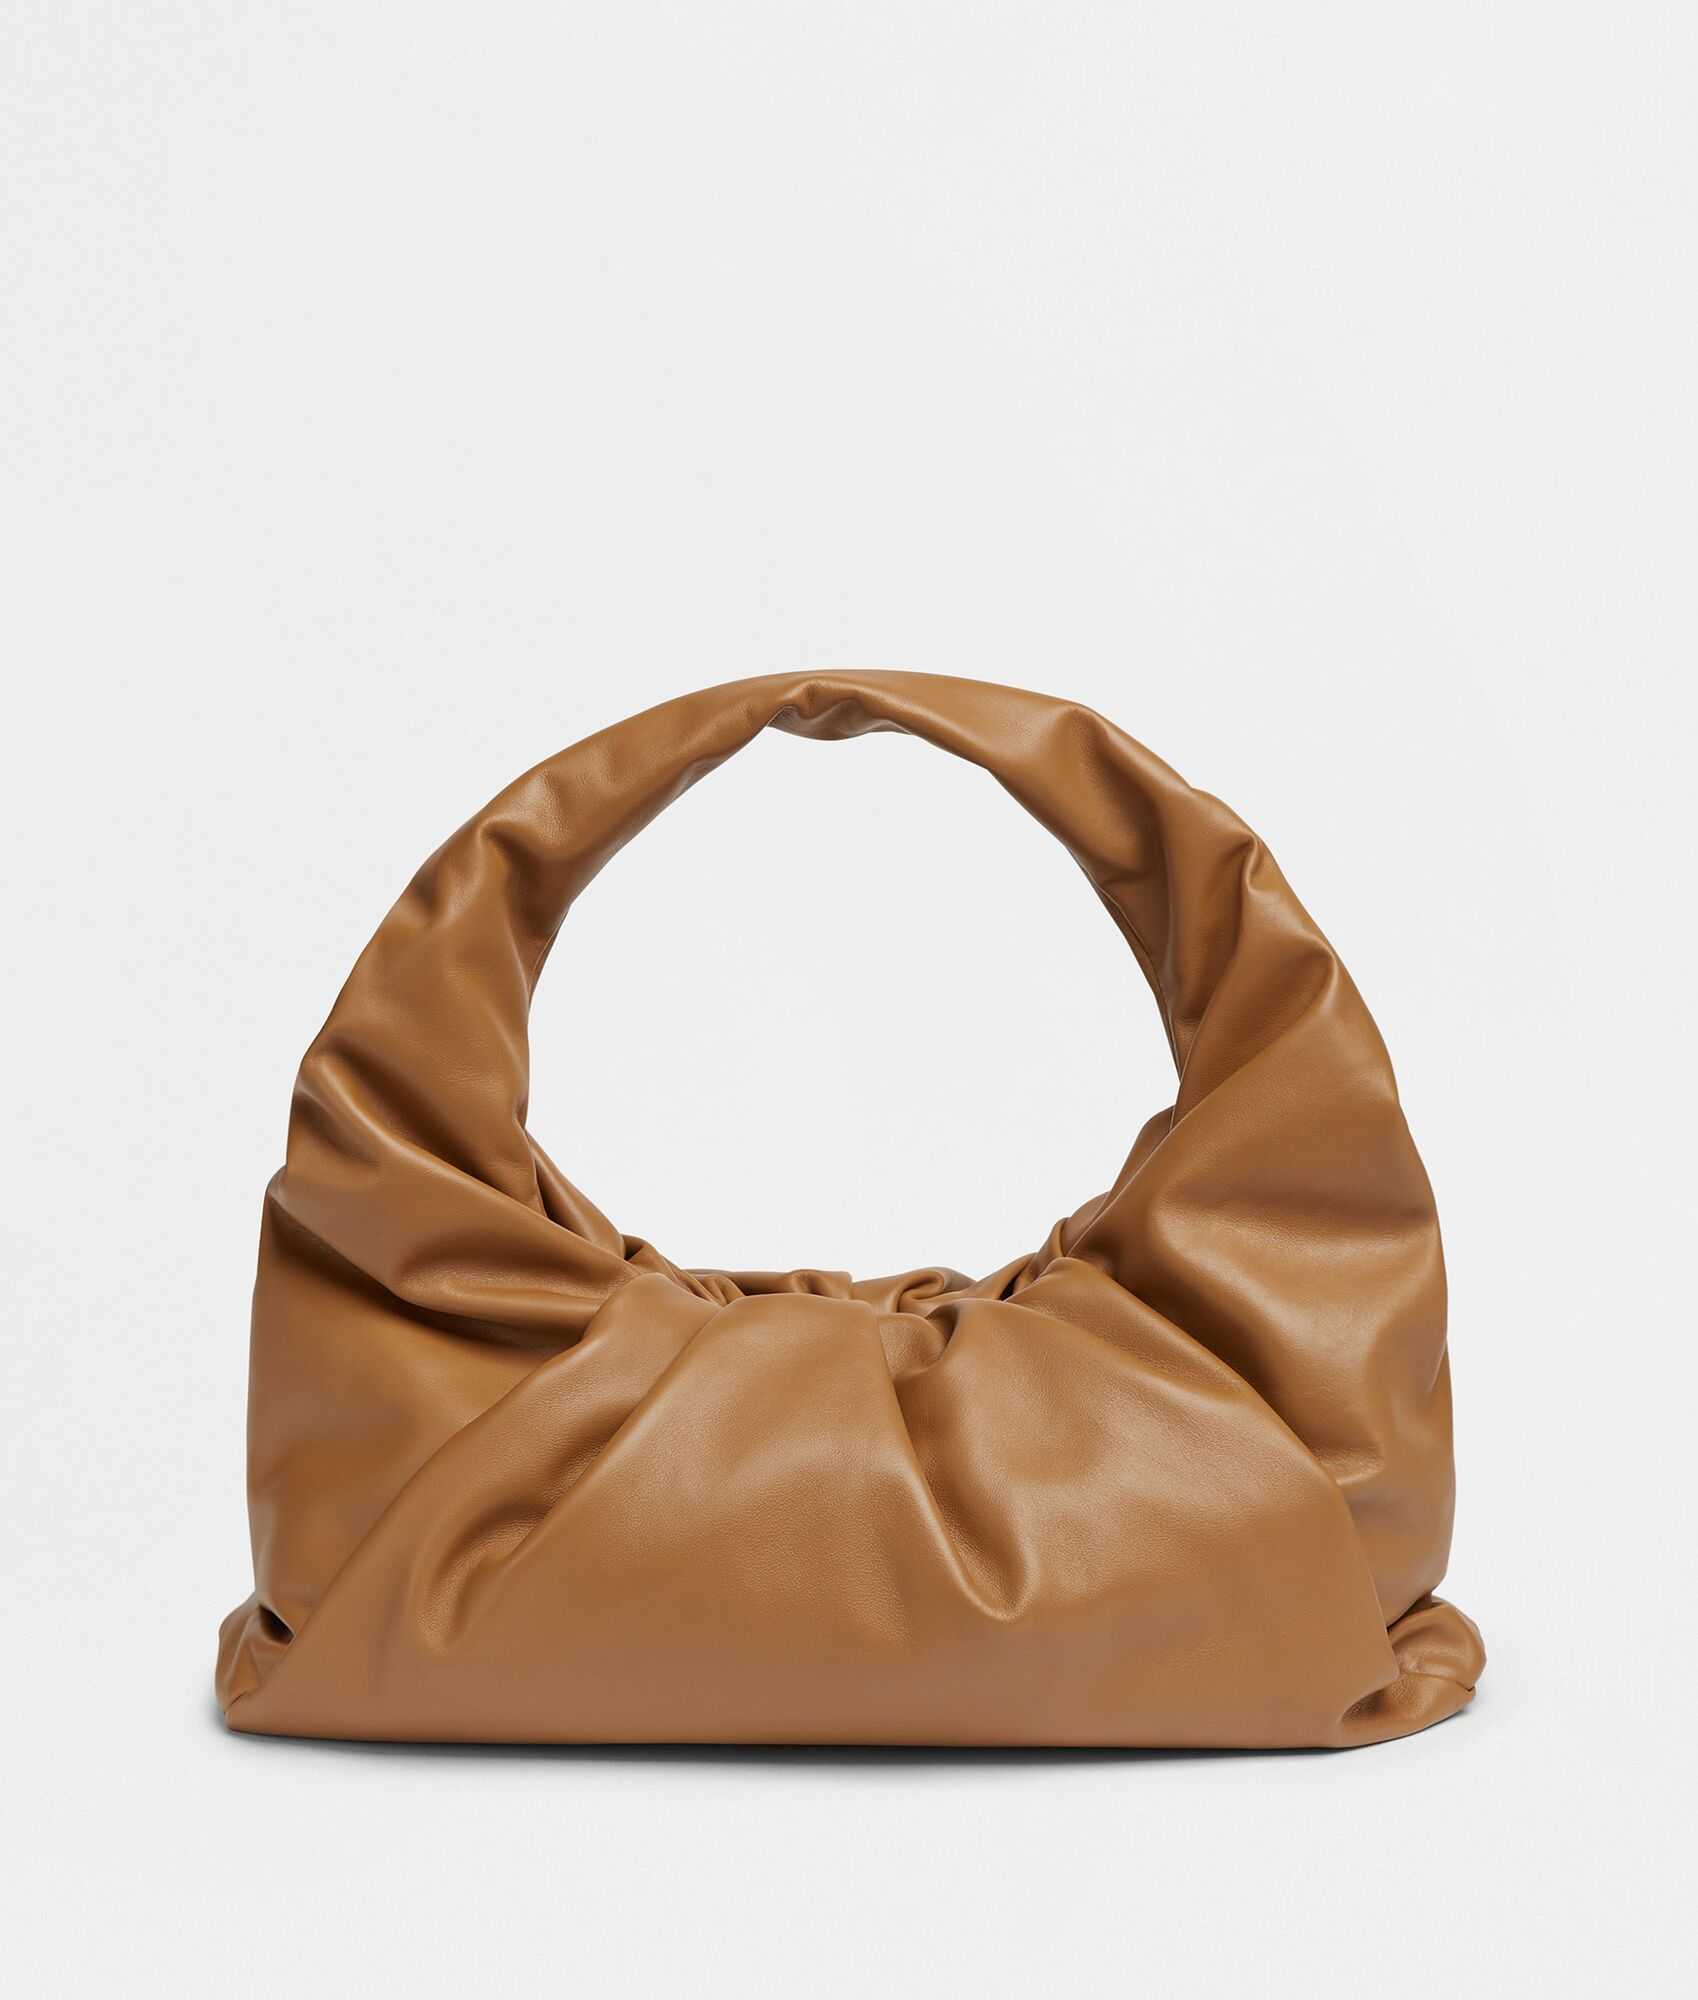 SHOULDER POUCH by Bottega Veneta, available on bottegaveneta.com for $2800 Hailey Baldwin Bags Exact Product